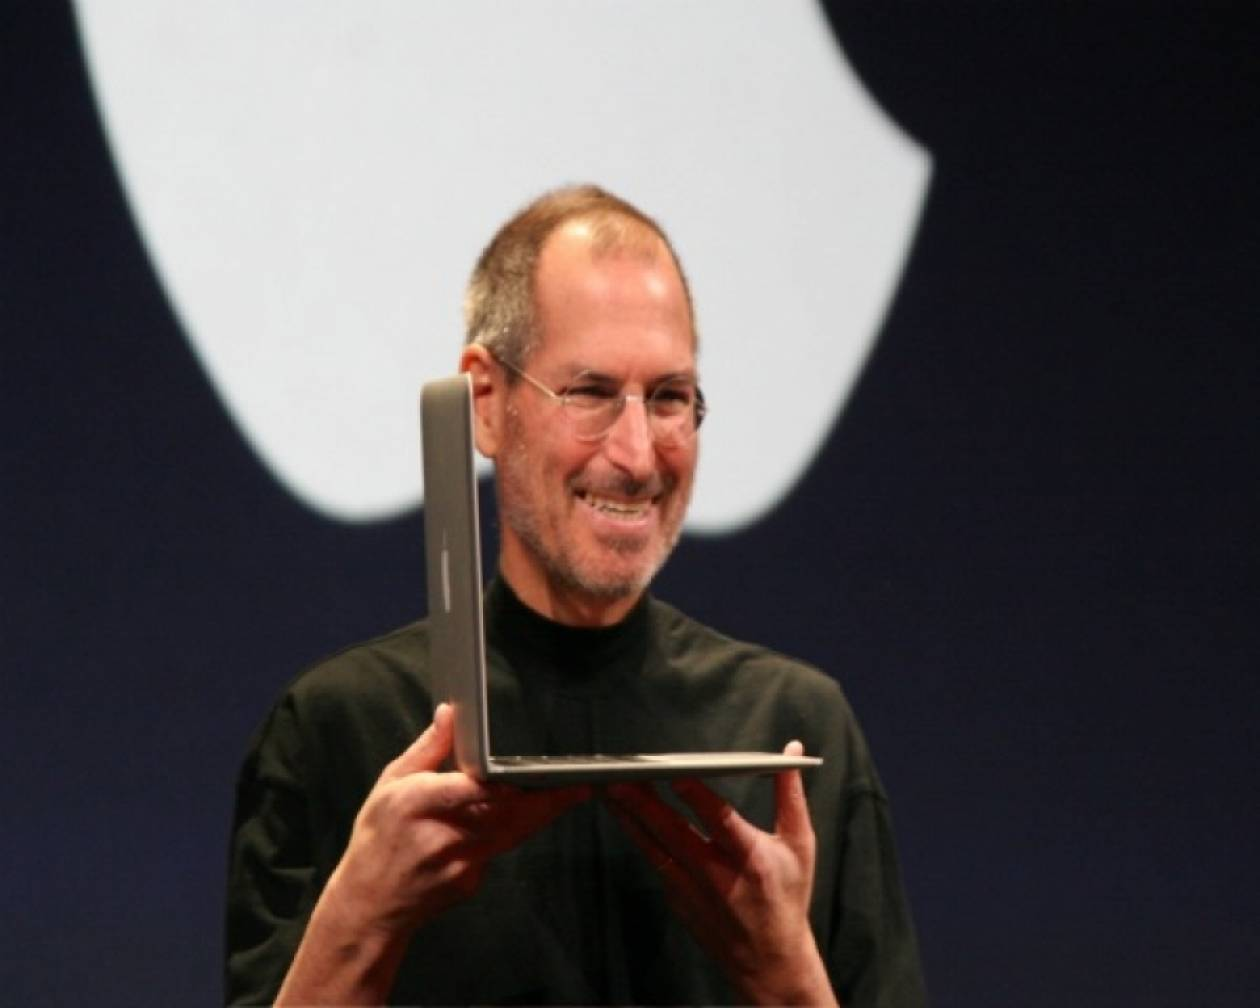 H «χαμένη συνέντευξη» του Steve Jobs στους κινηματογράφους